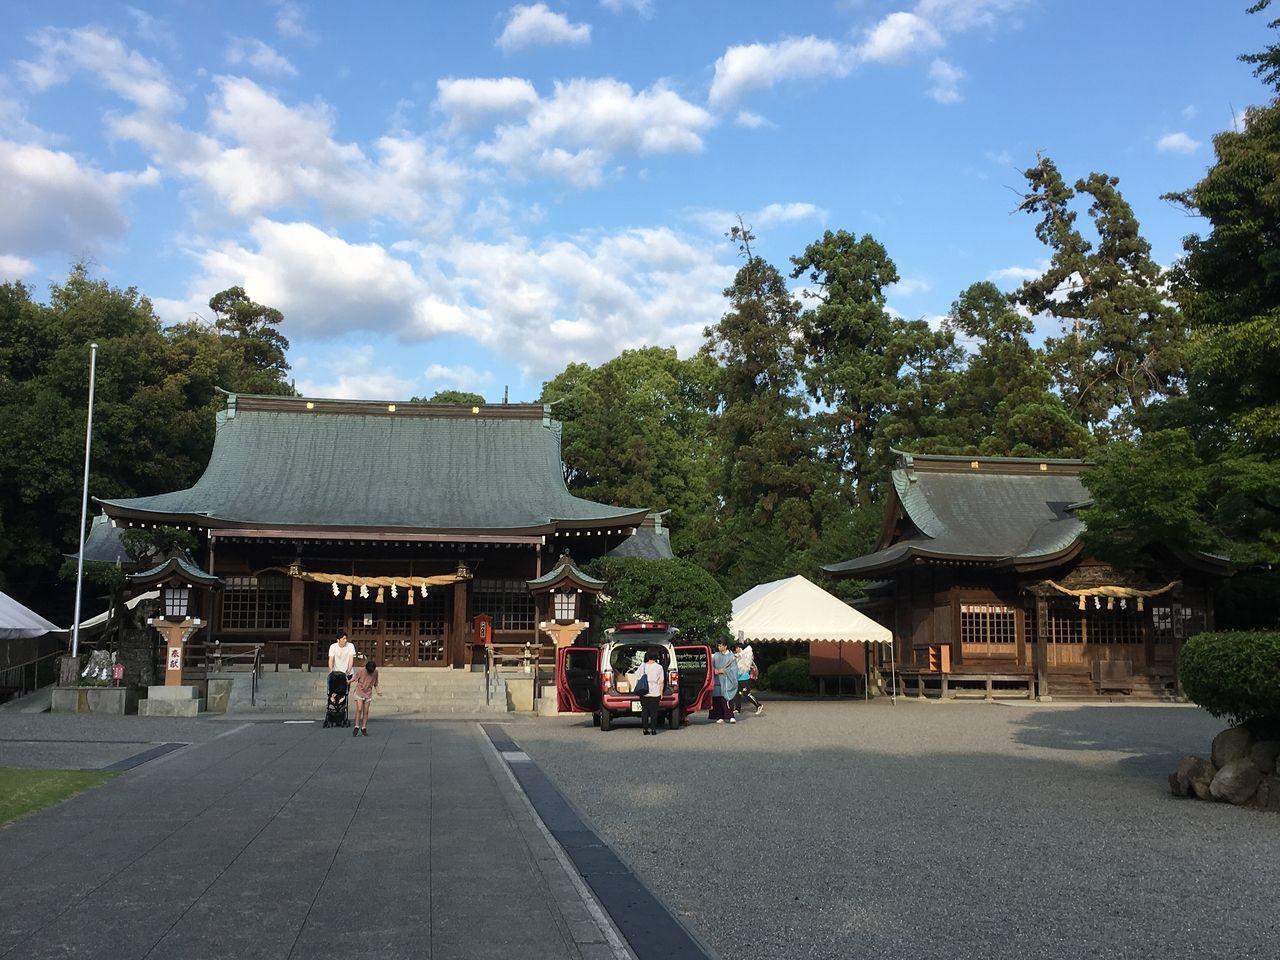 初夏の健軍神社・本殿と儀式殿